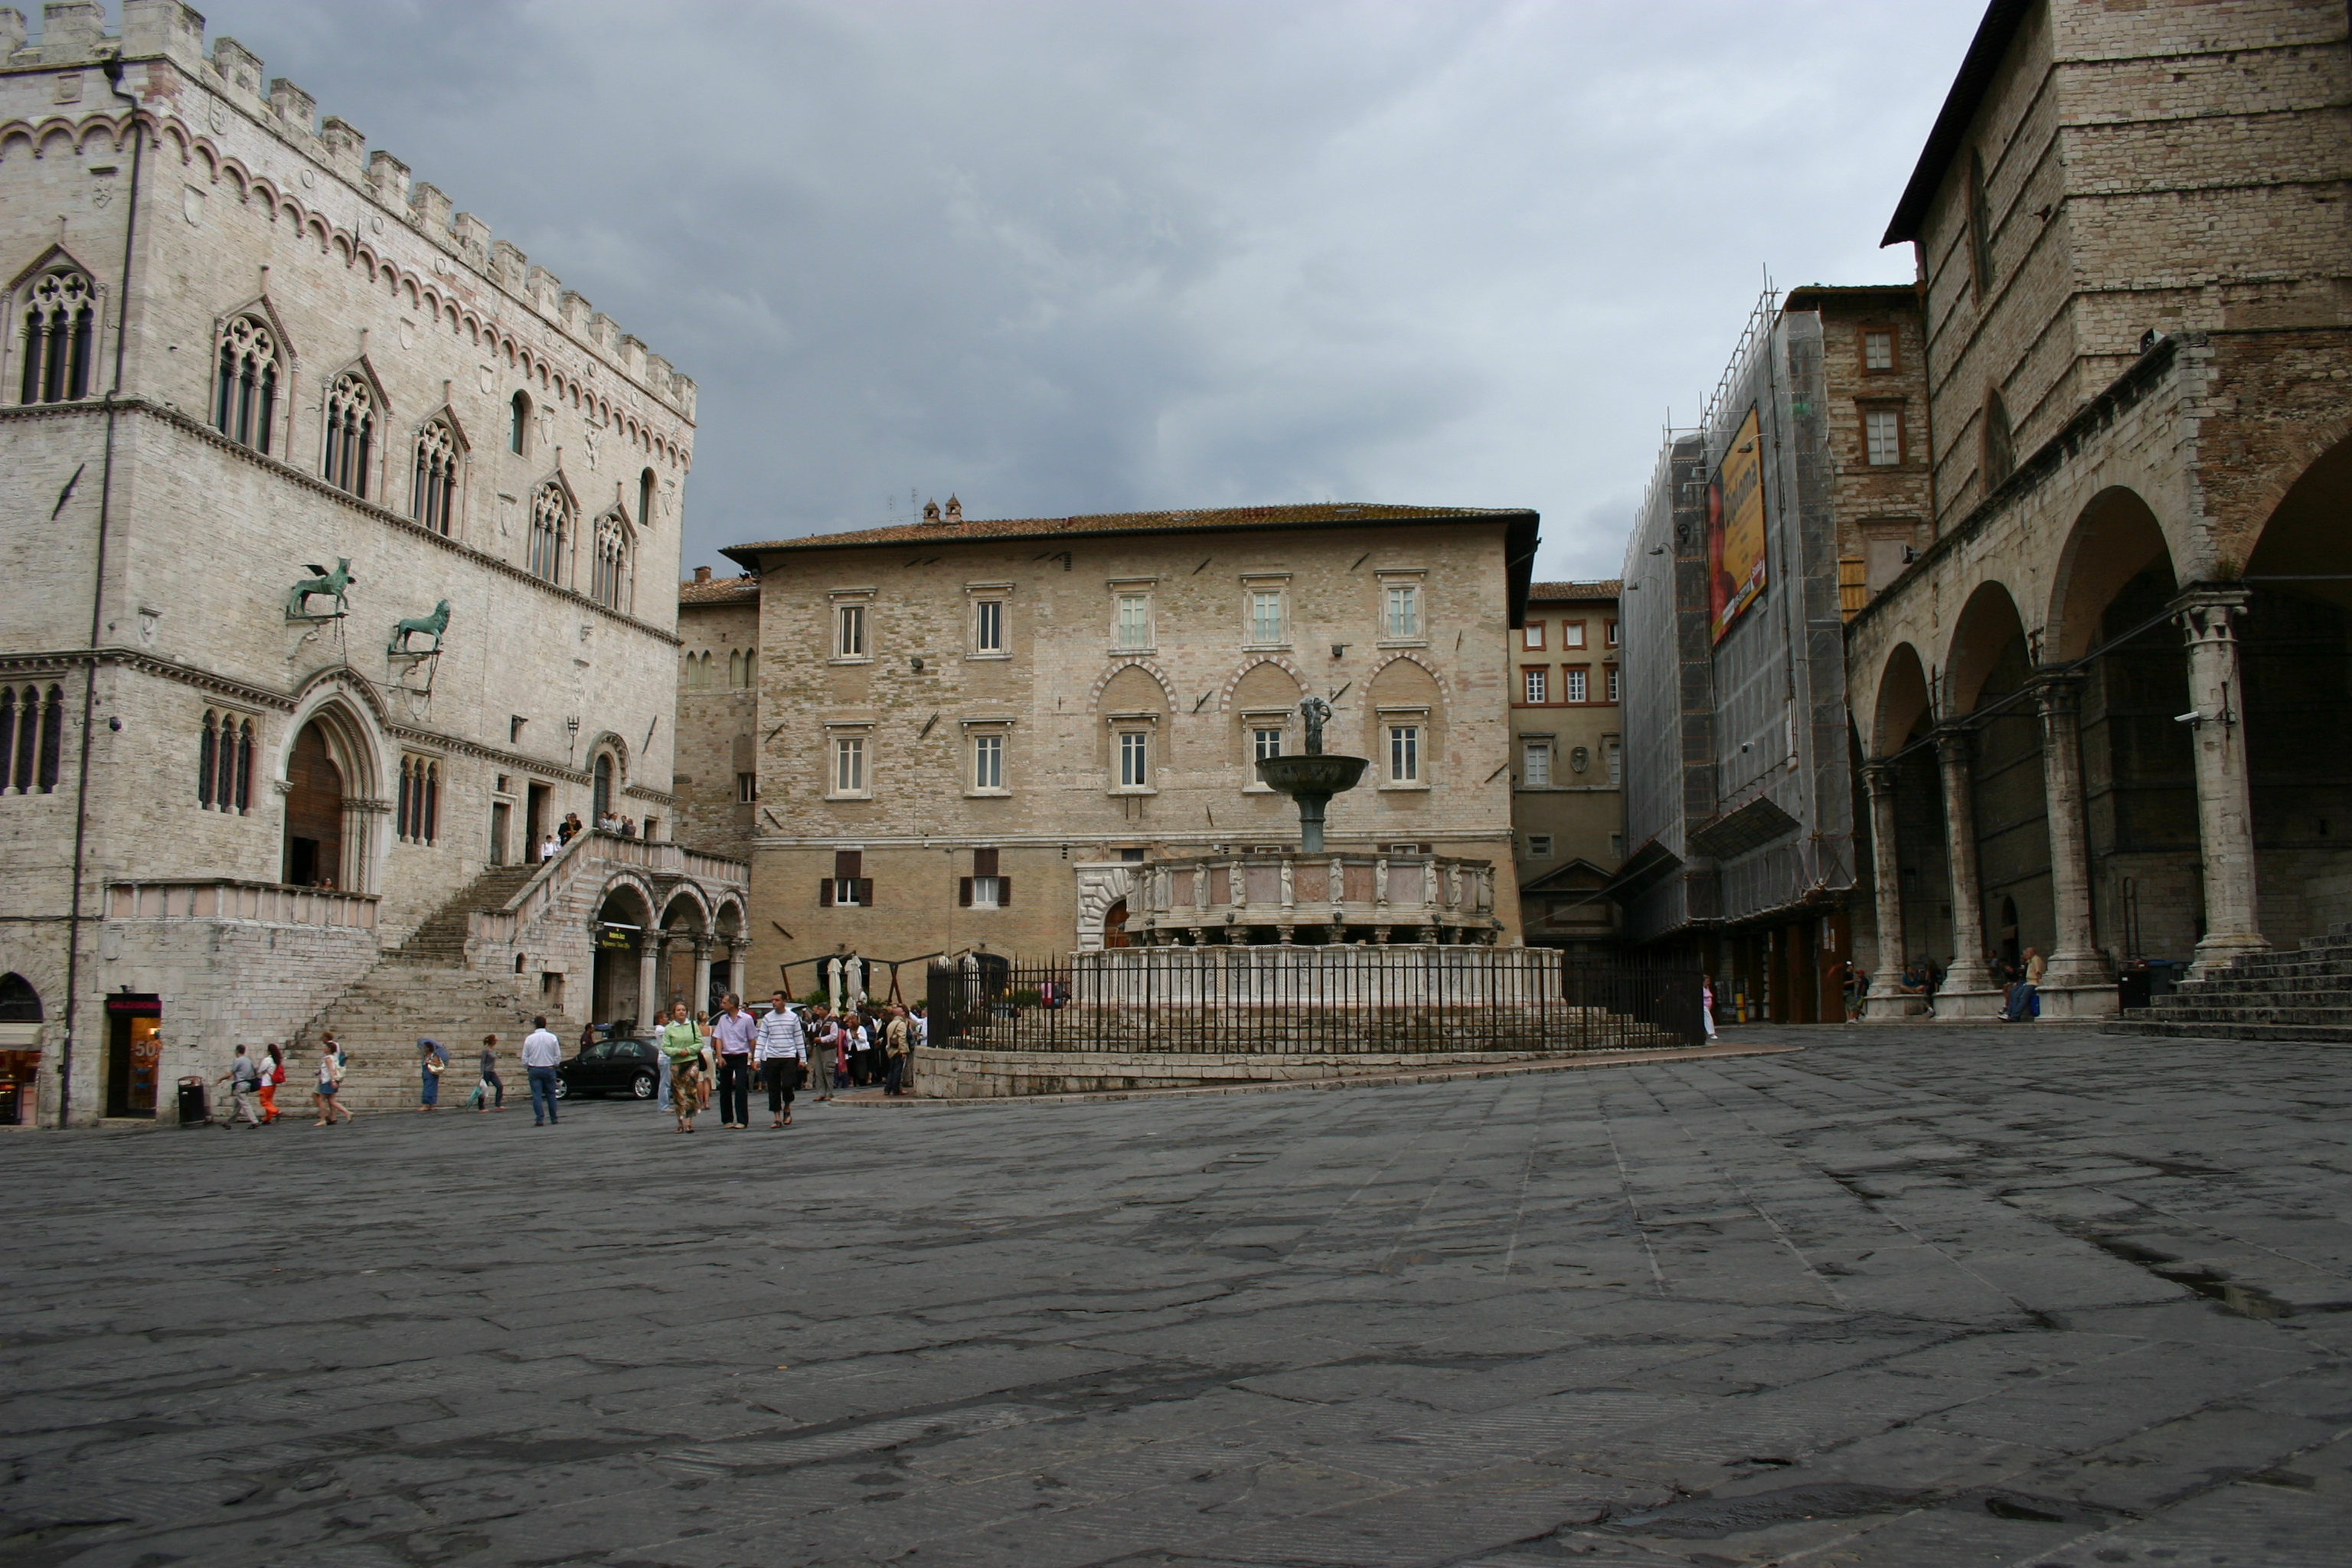 Perugia fr n edinburgh till istanbul for Arredare milano piazza iv novembre